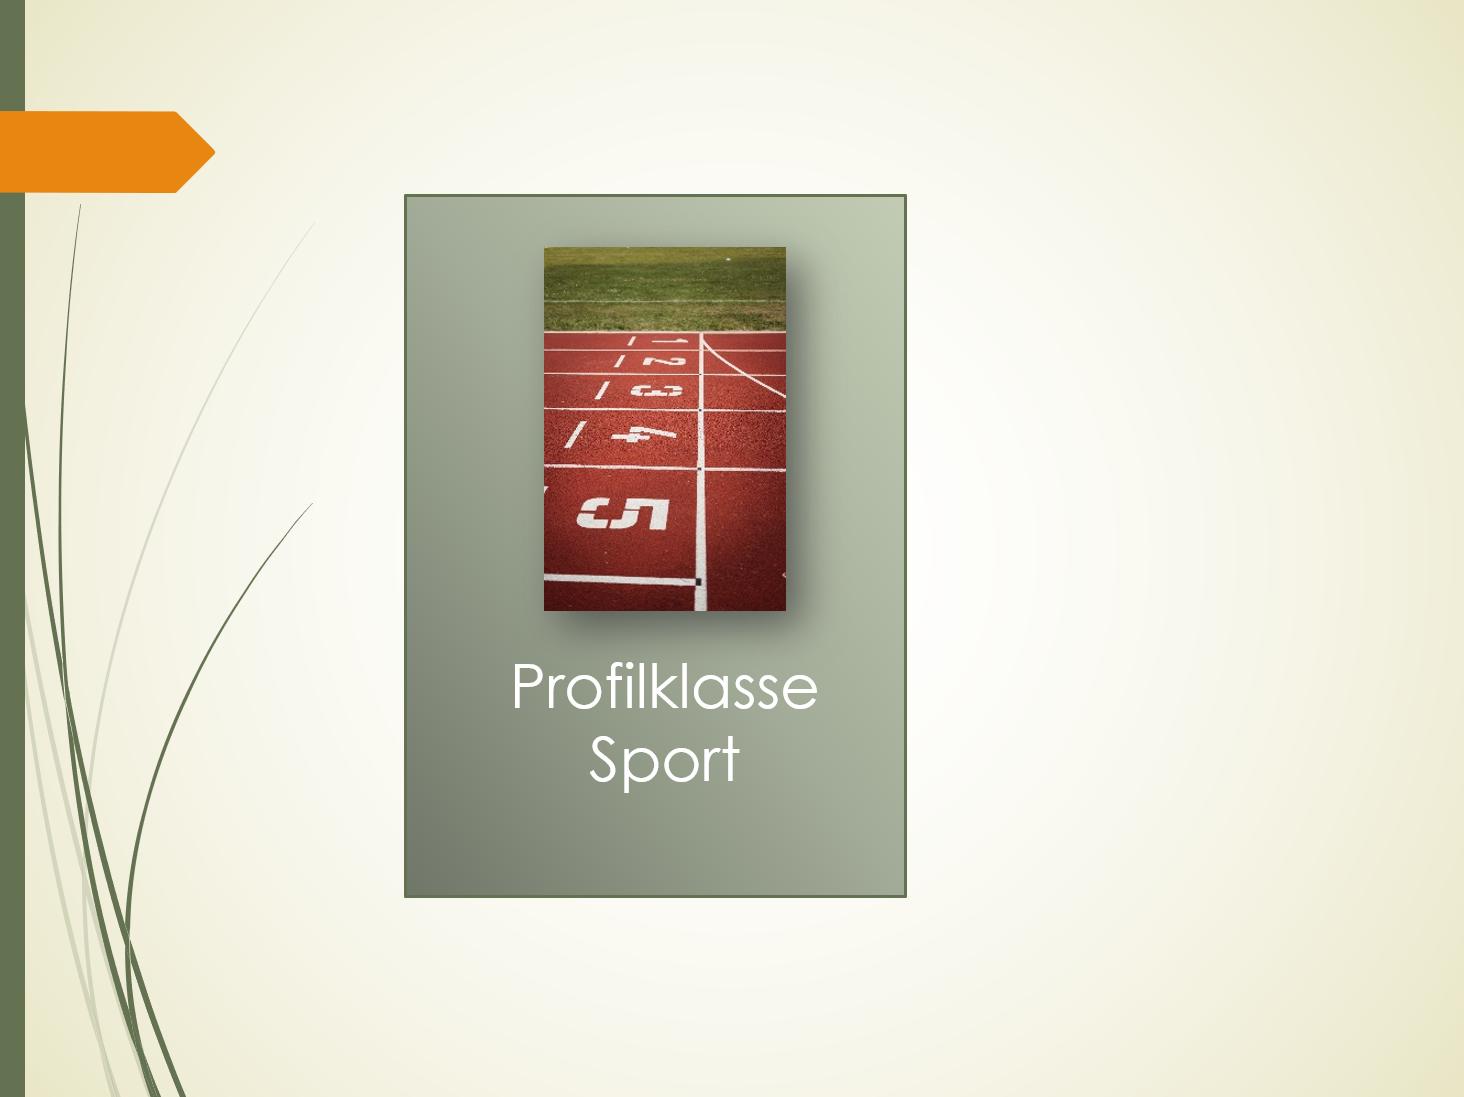 Profilklasse